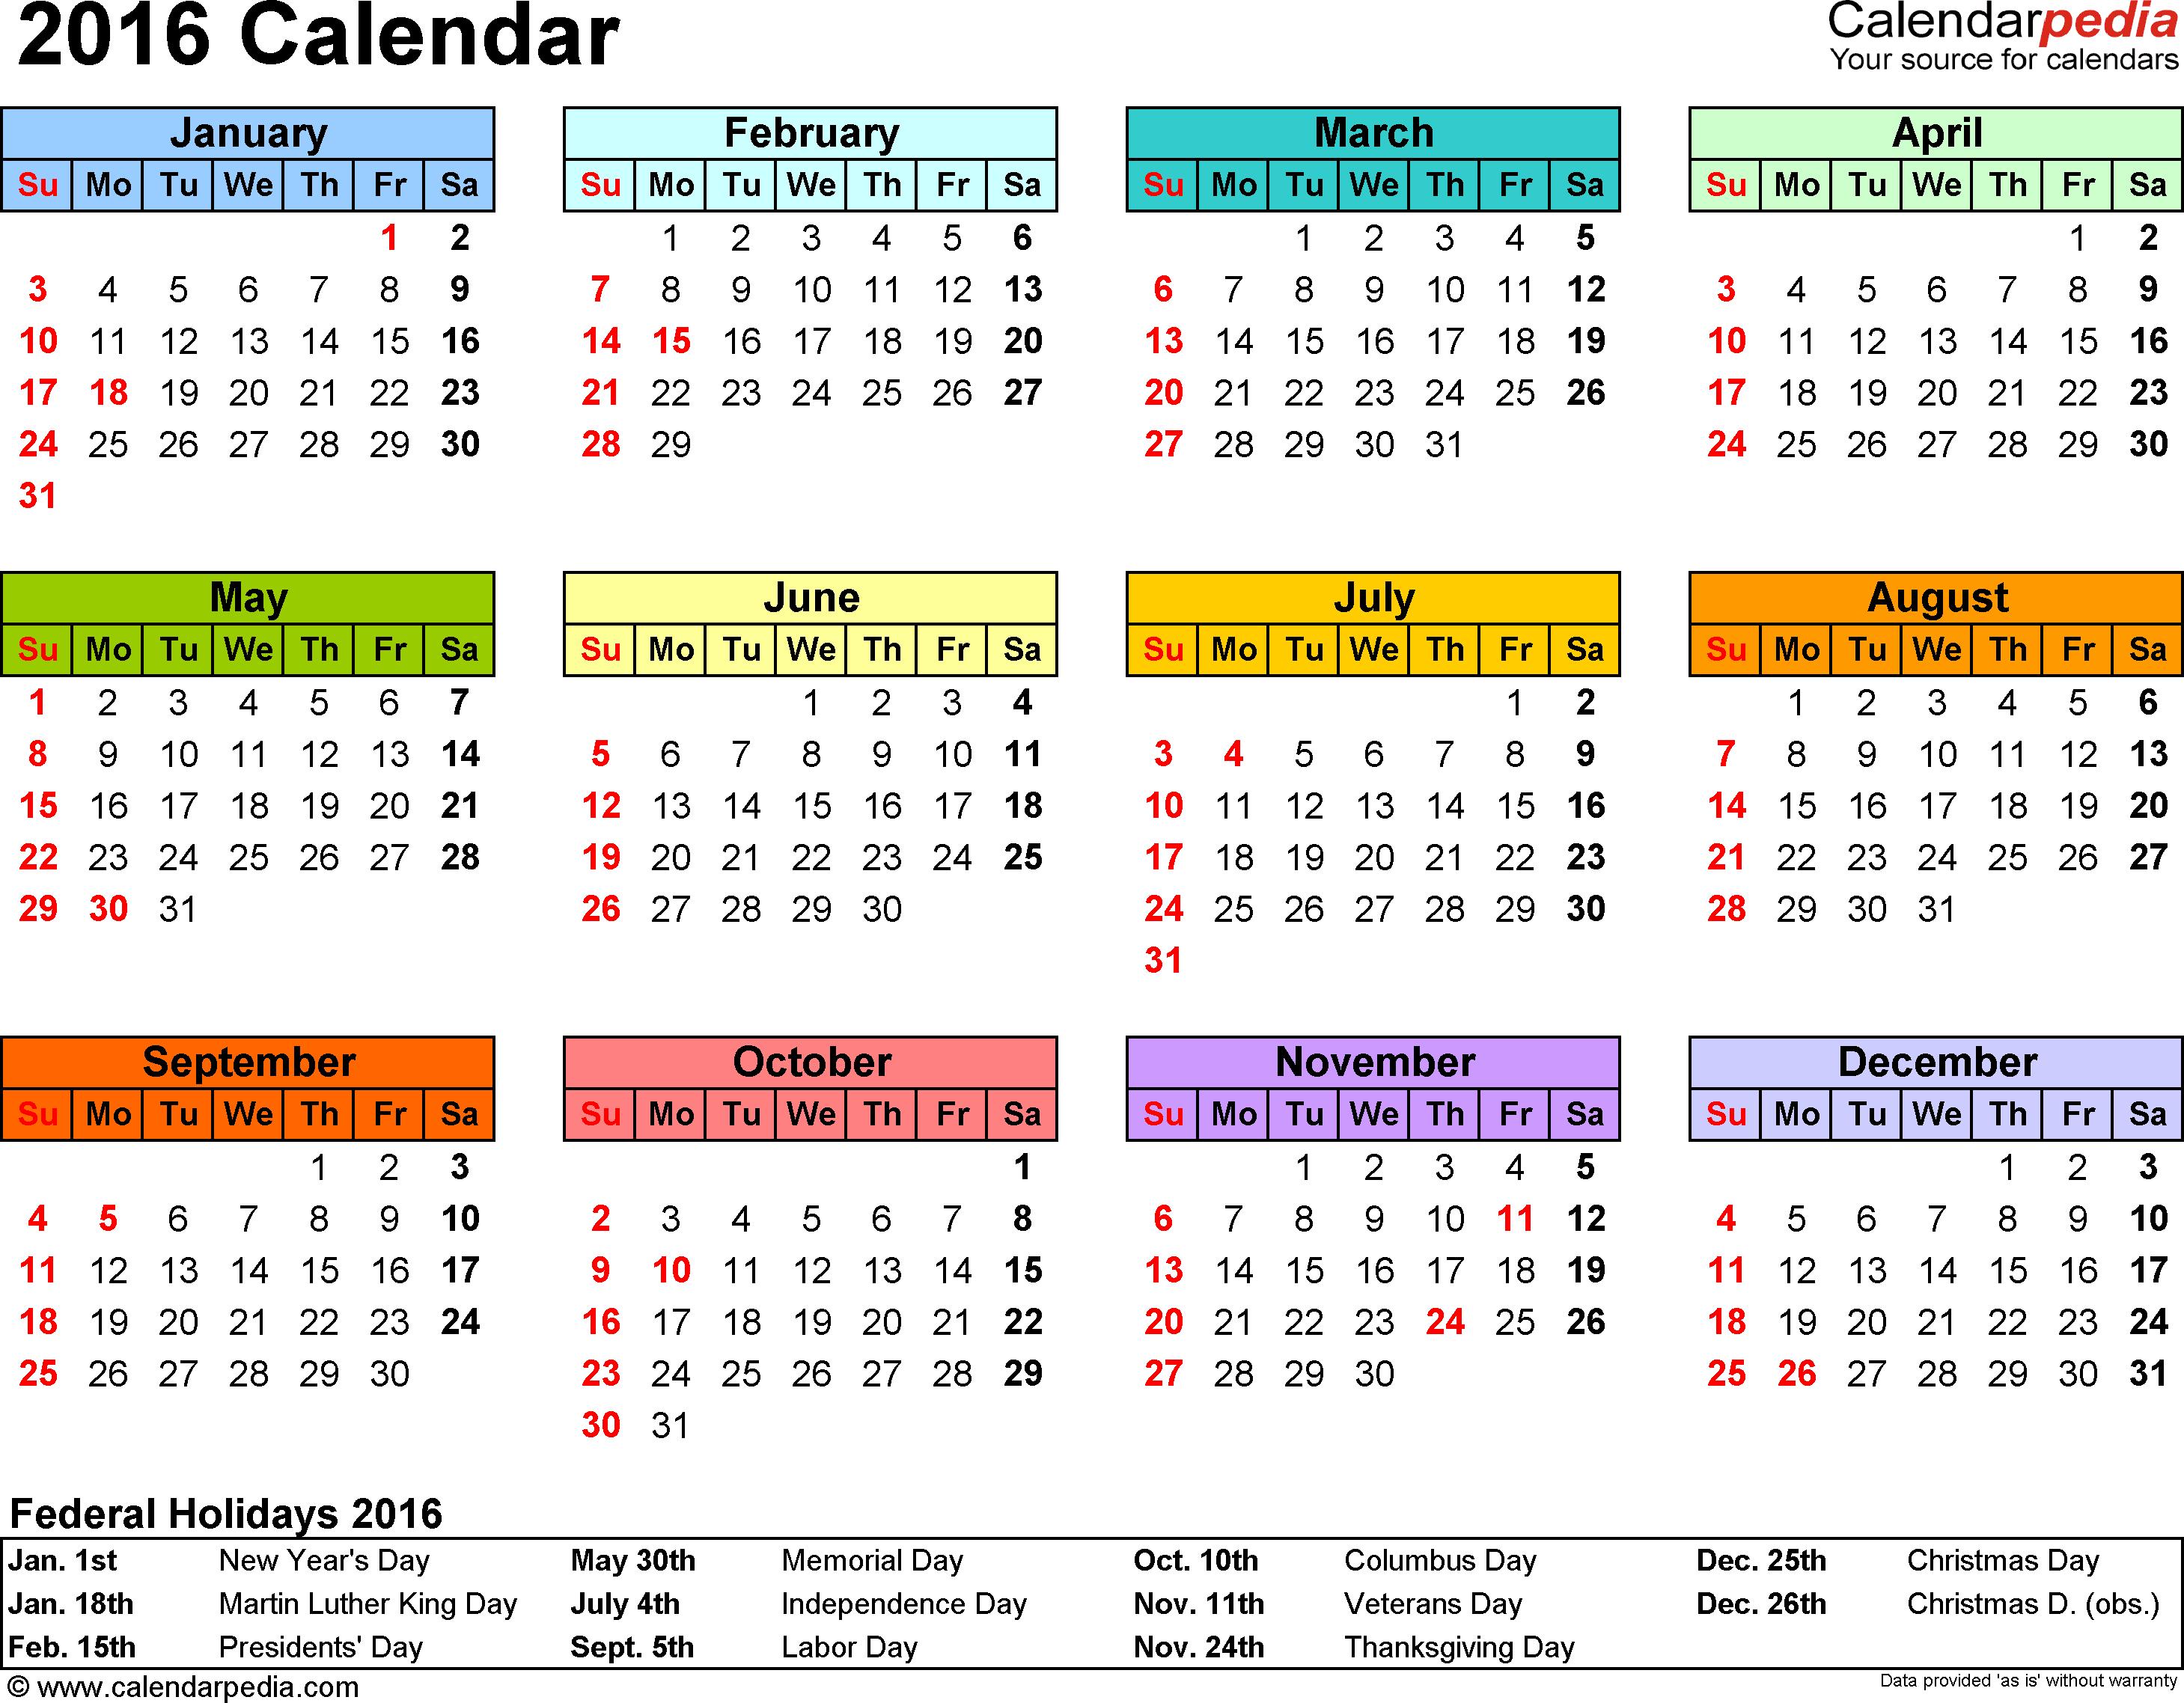 001 Template Ideas Yearlyalendar Awful 2016 Yearly Calendar